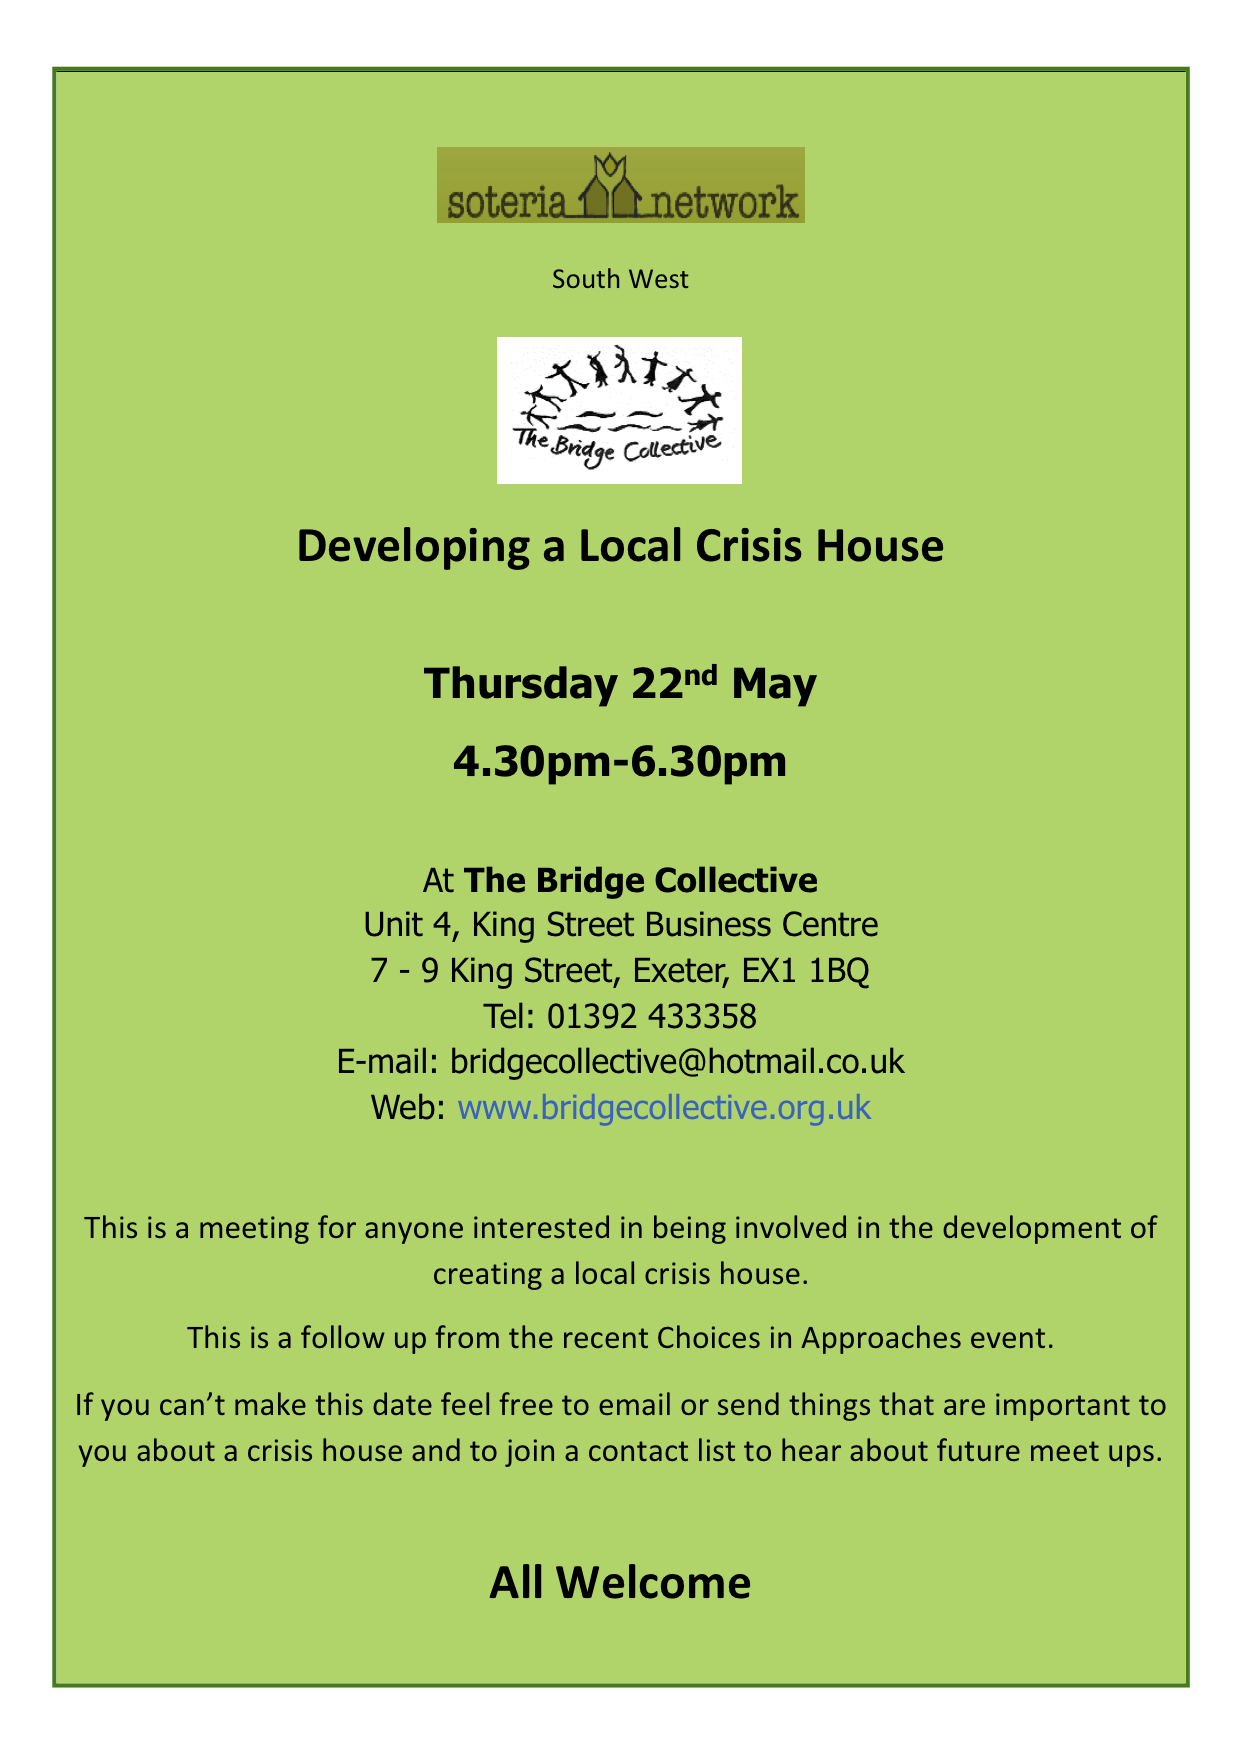 https://www.bridgecollective.org.uk/wp-content/uploads/2014/03/crisis-house-poster.jpg